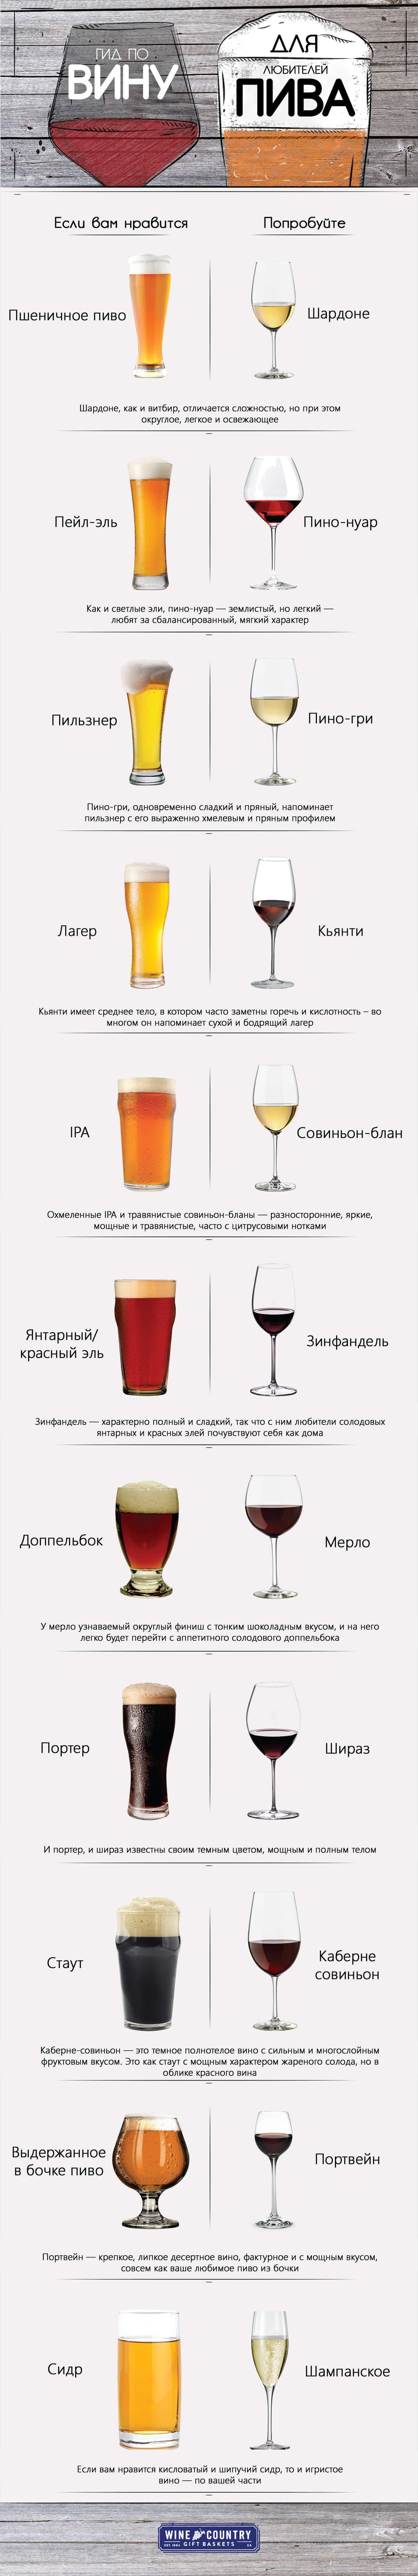 Гайд по выбору вина для любителей пива